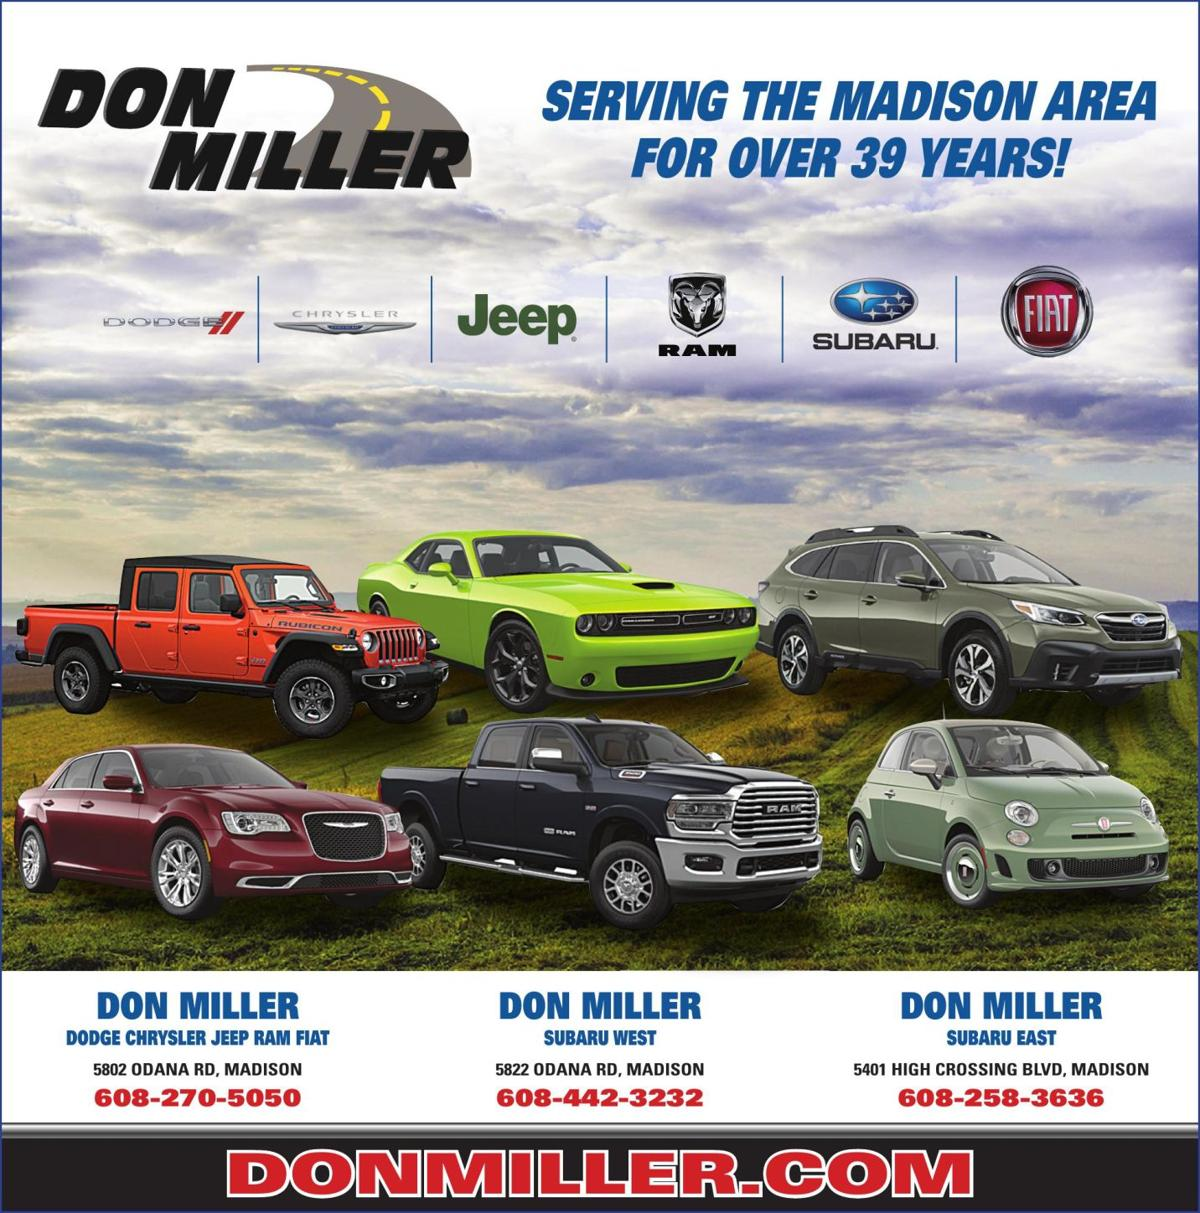 Don Miller Subaru East >> 3791289 Pdf Ad Vault Madison Com